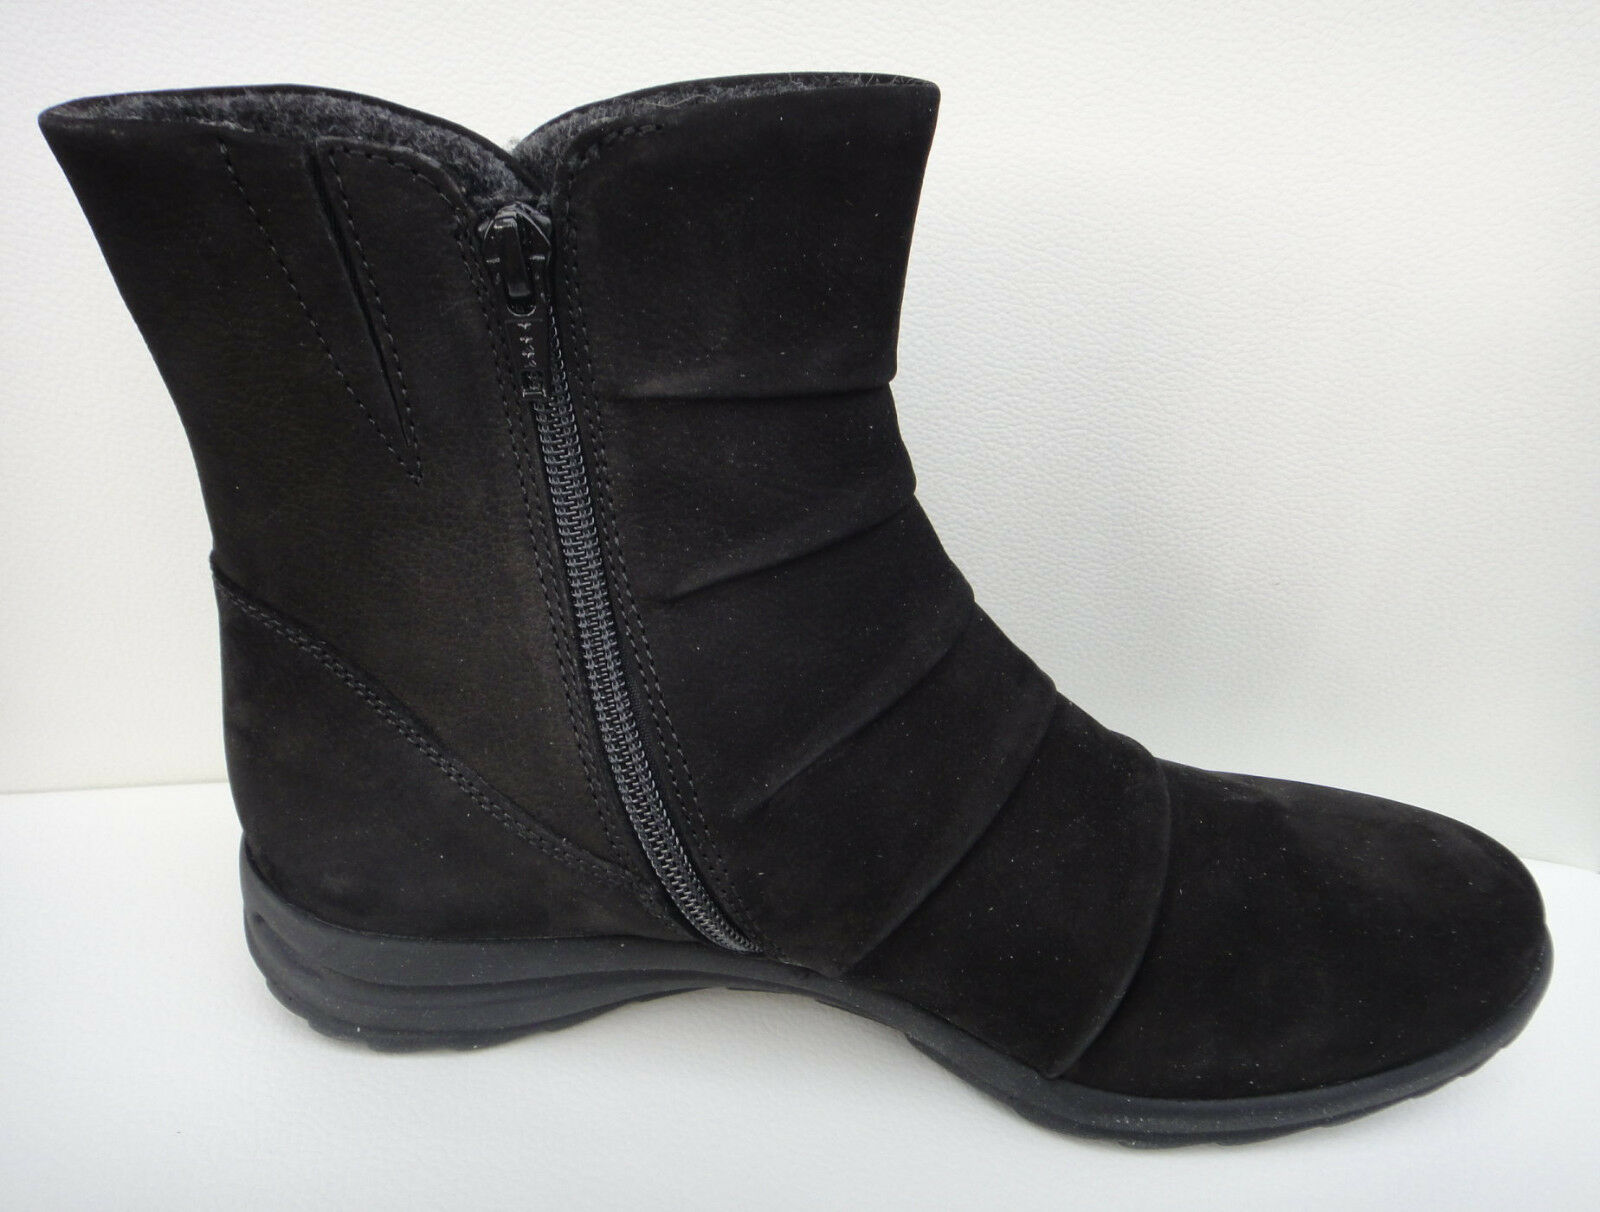 Gabor Boots Neu Stiefelette Nubuk Leder schwarz Neu Boots 4 4,5 37 37,5 89791c